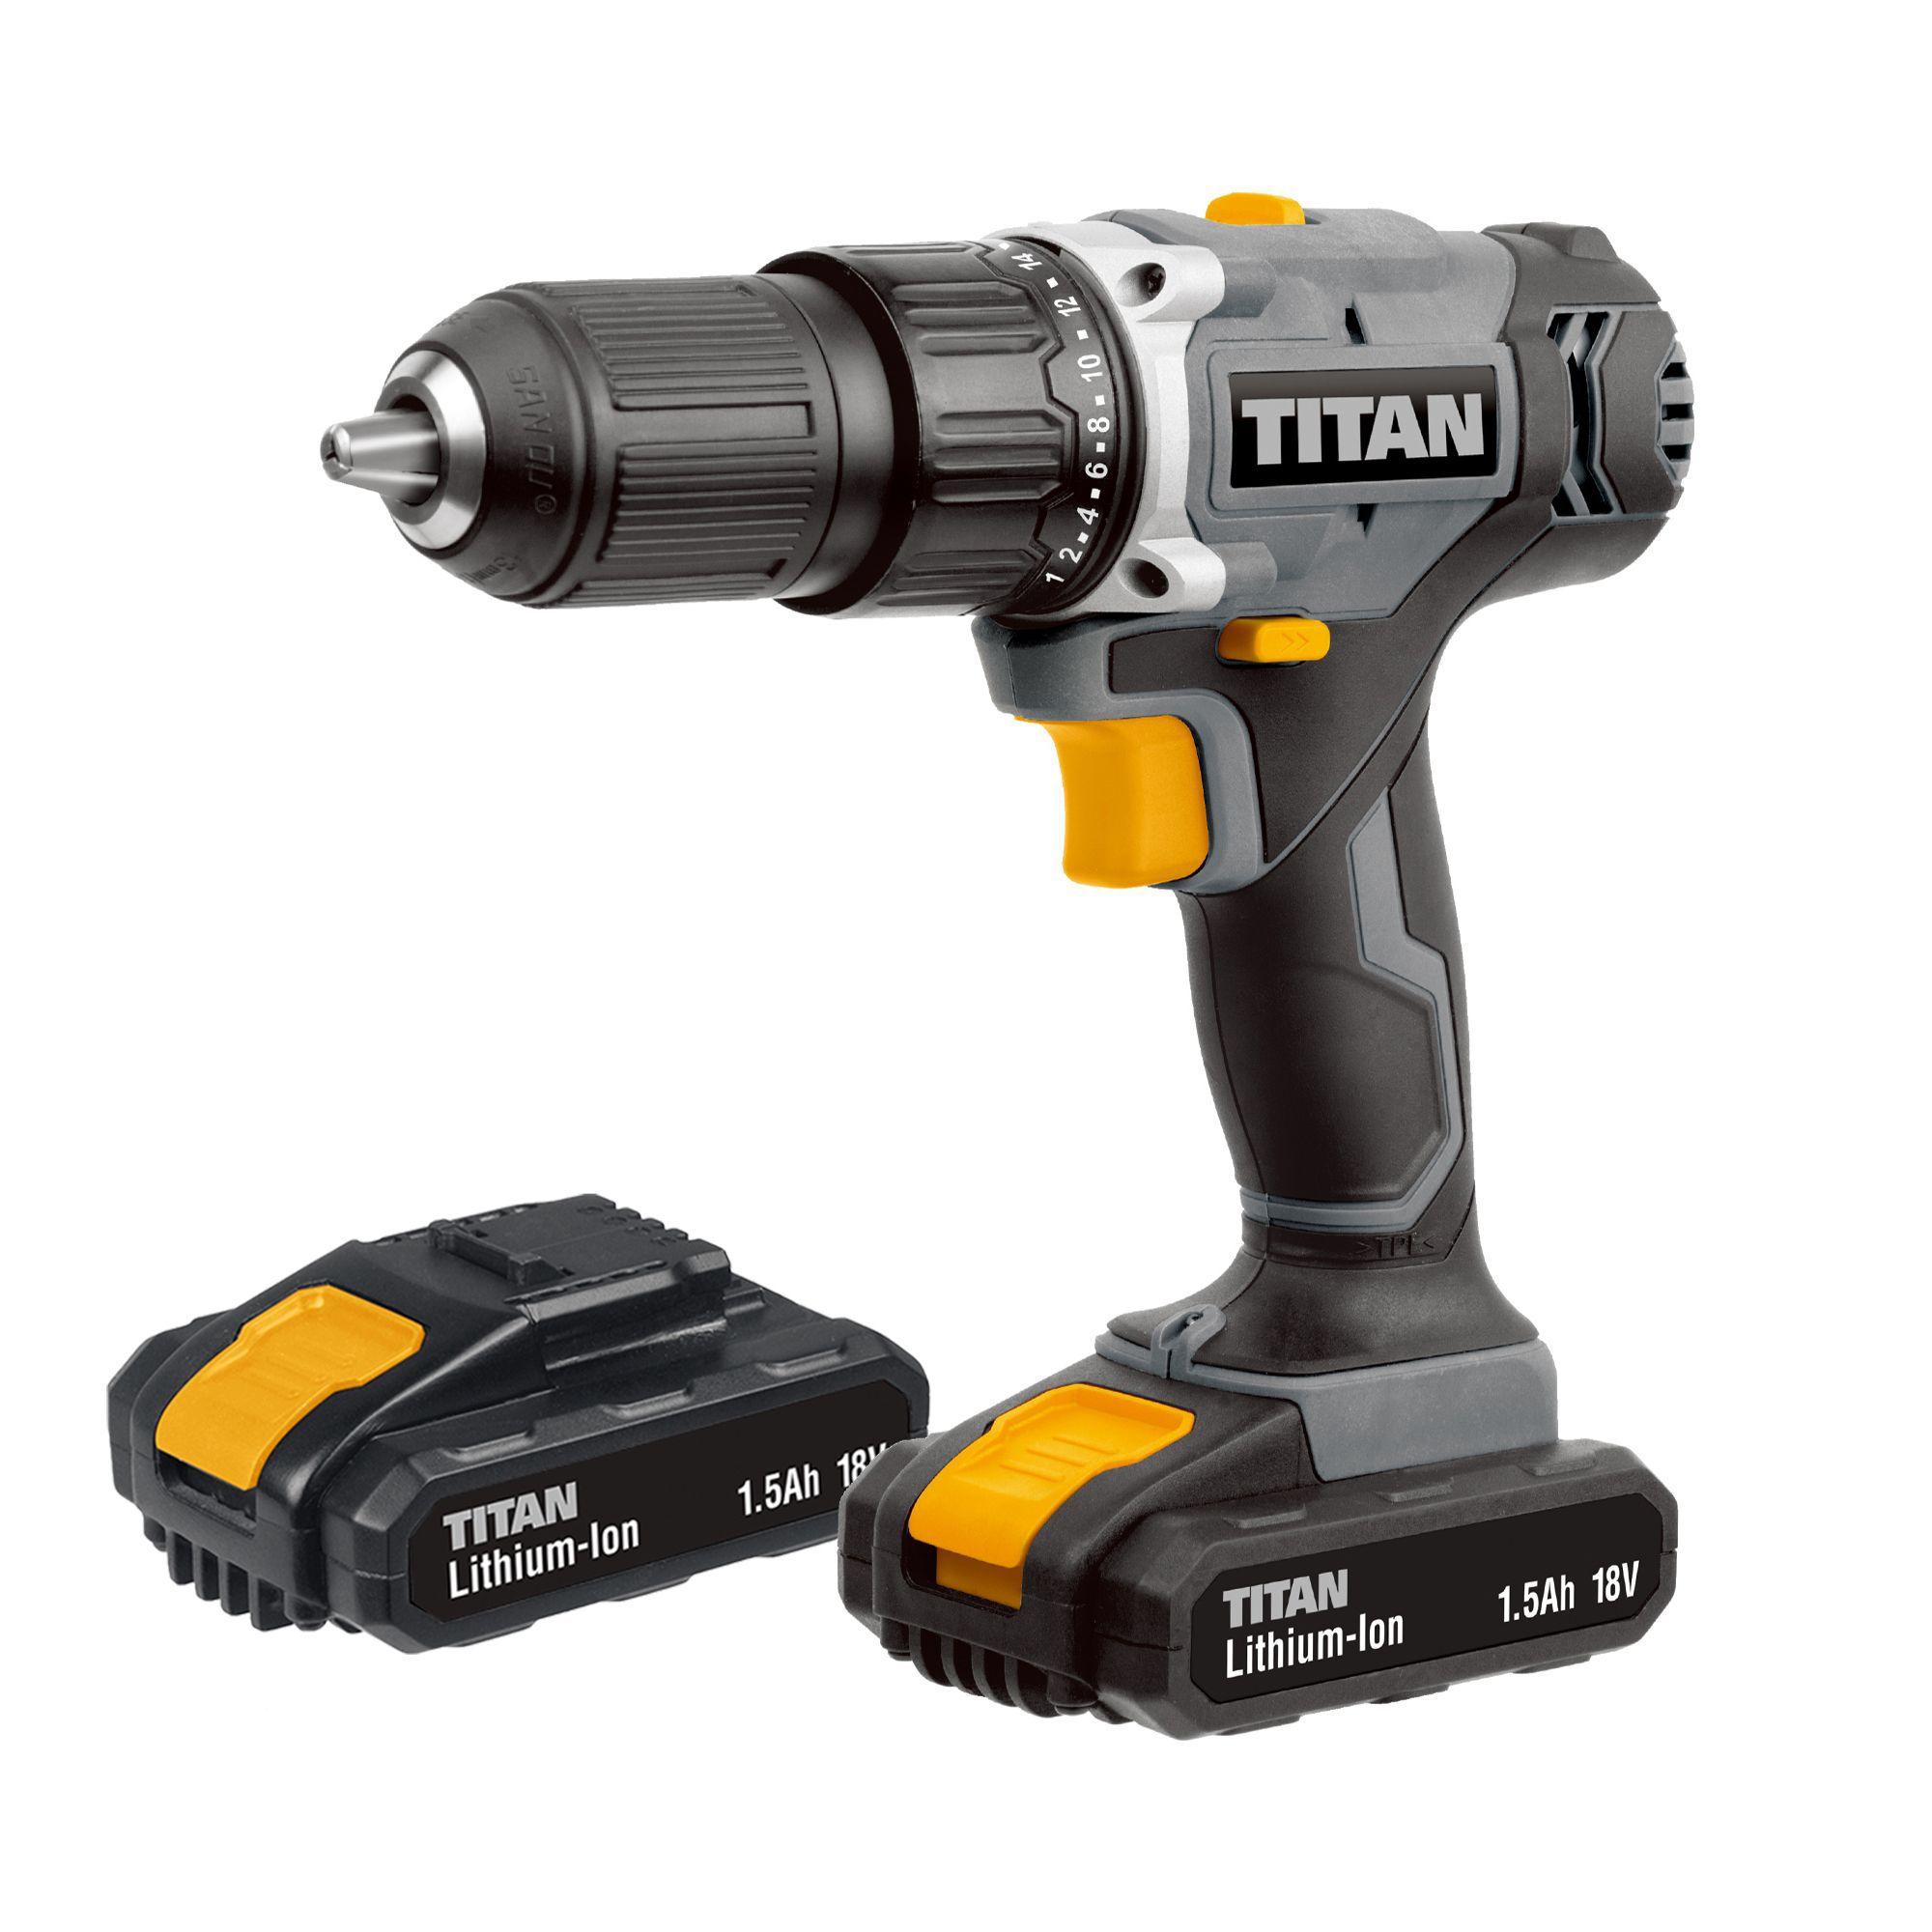 Titan Cordless 18v 1.5ah Li-ion Combi Drill 2 Batteries Tti699com